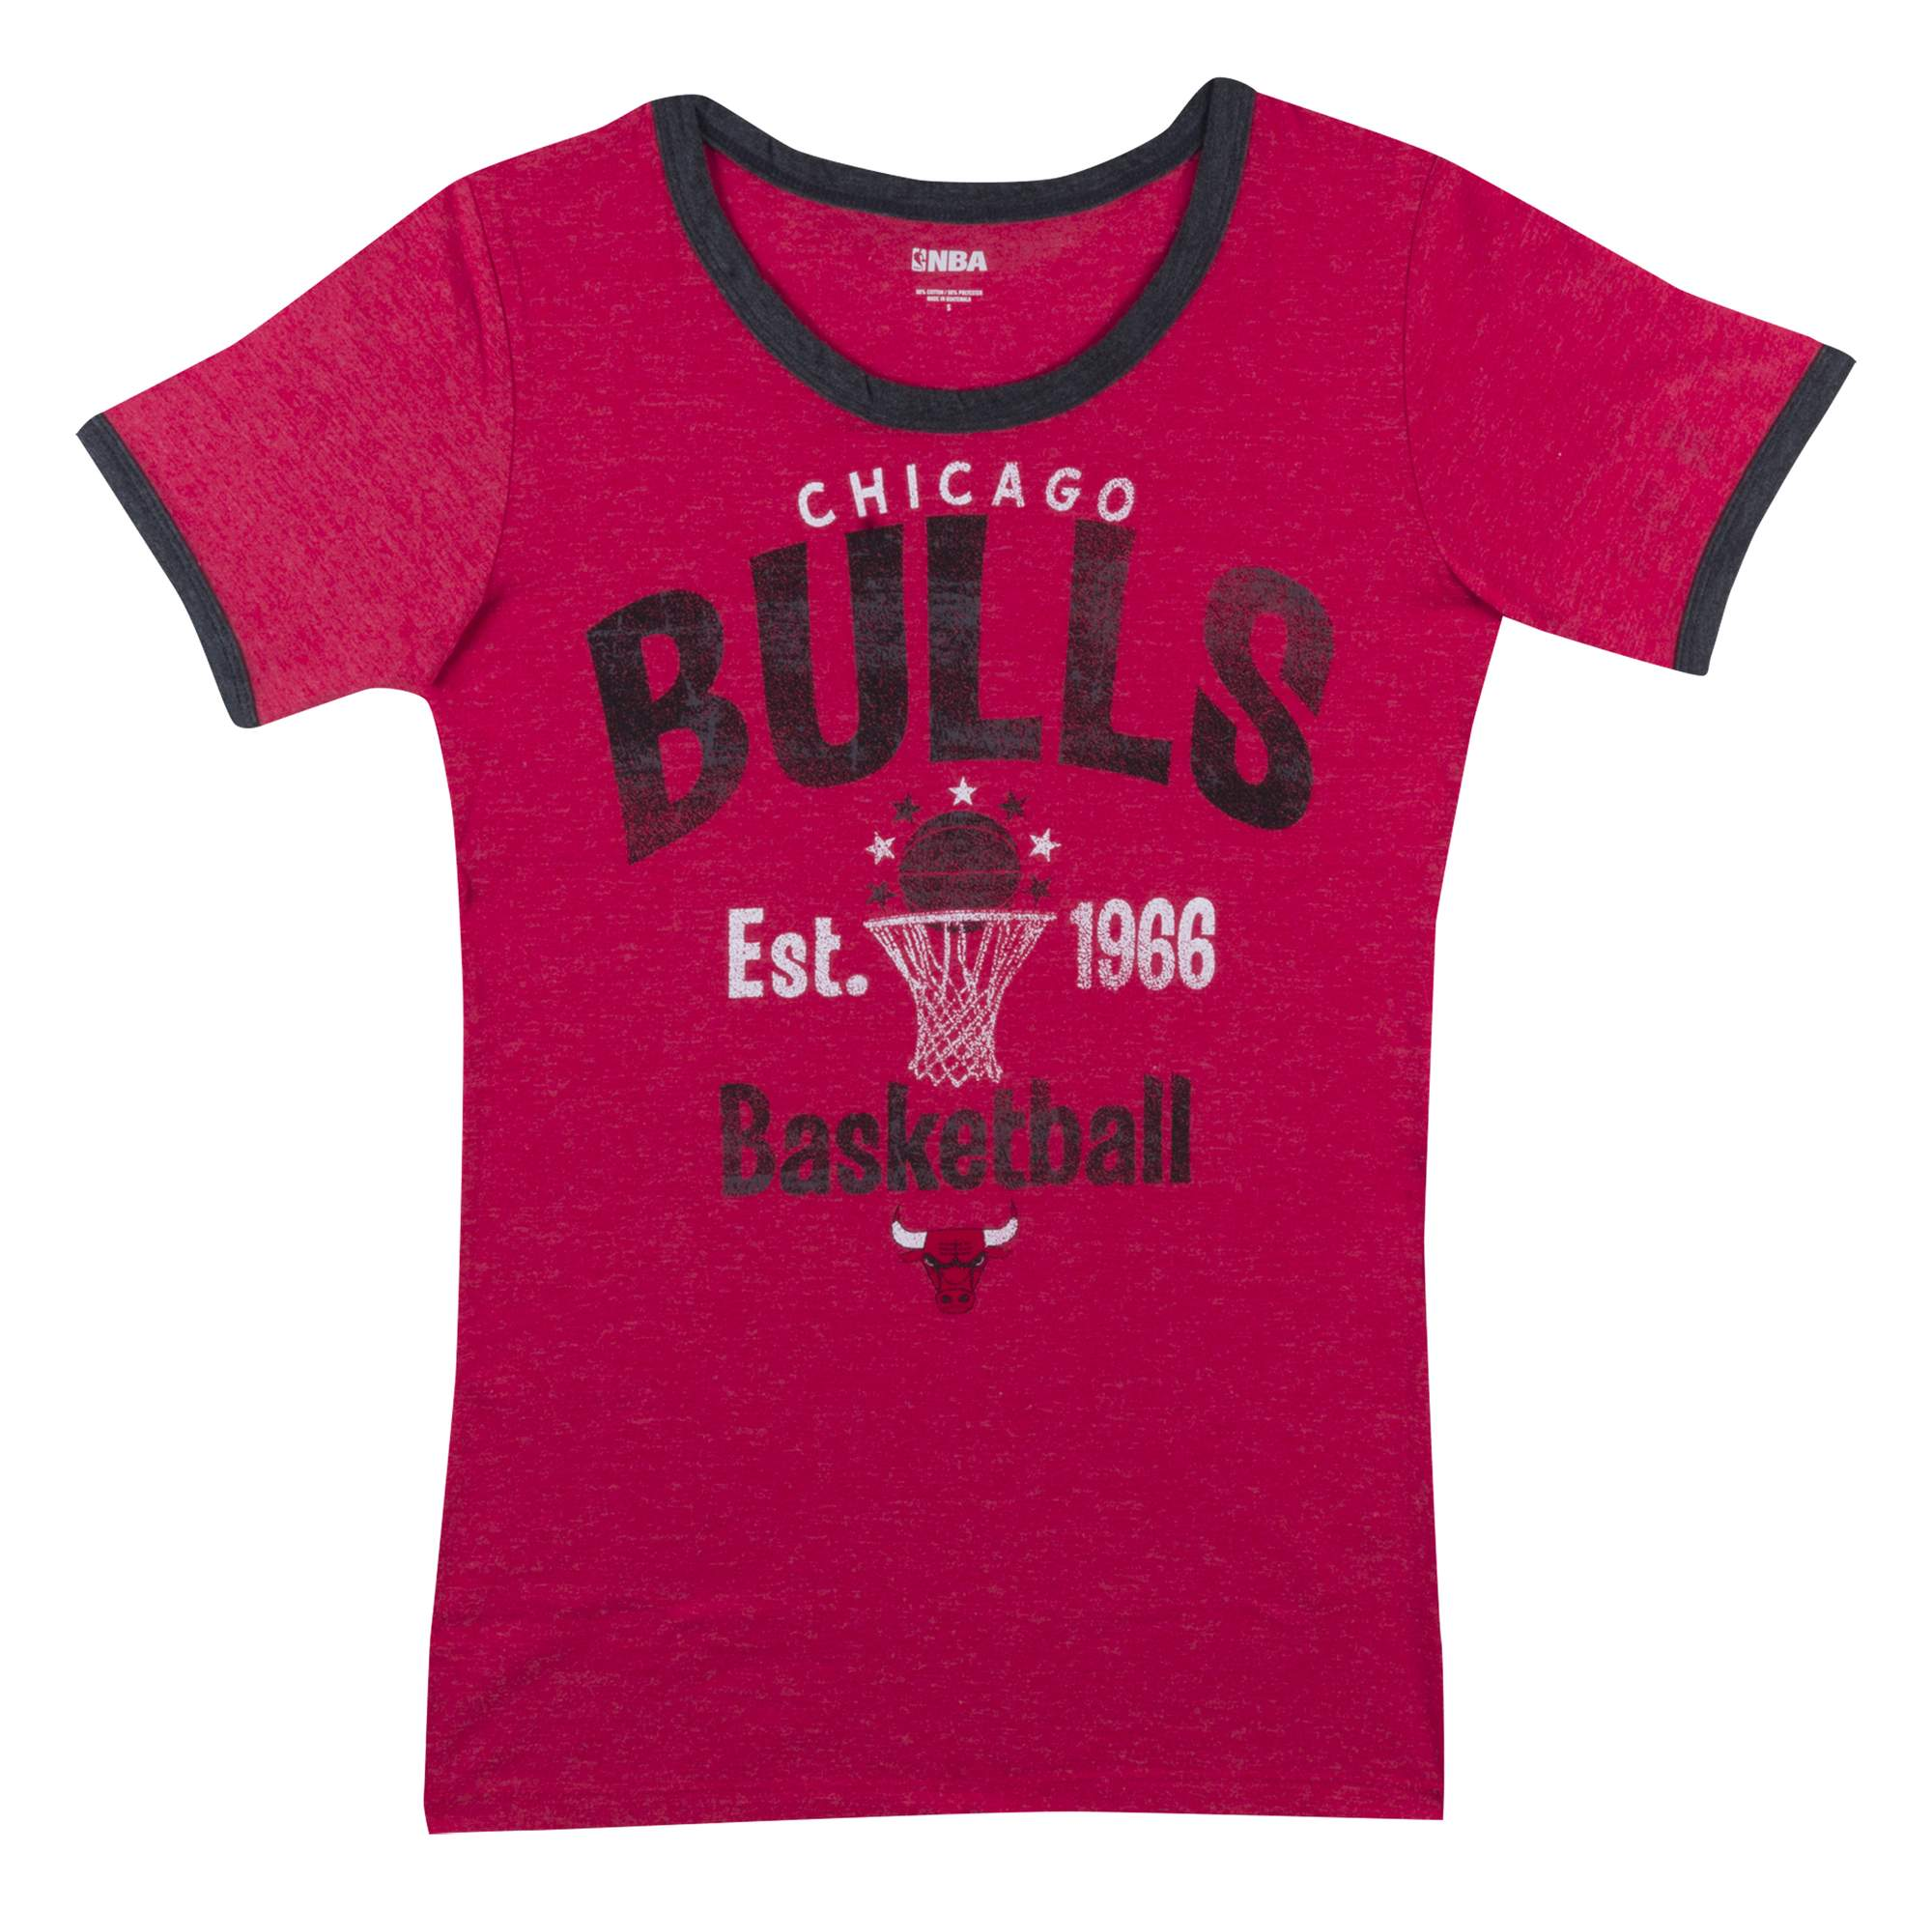 Chicago Bulls Women's NBA Short Sleeve Biblend Crew Neck Tee